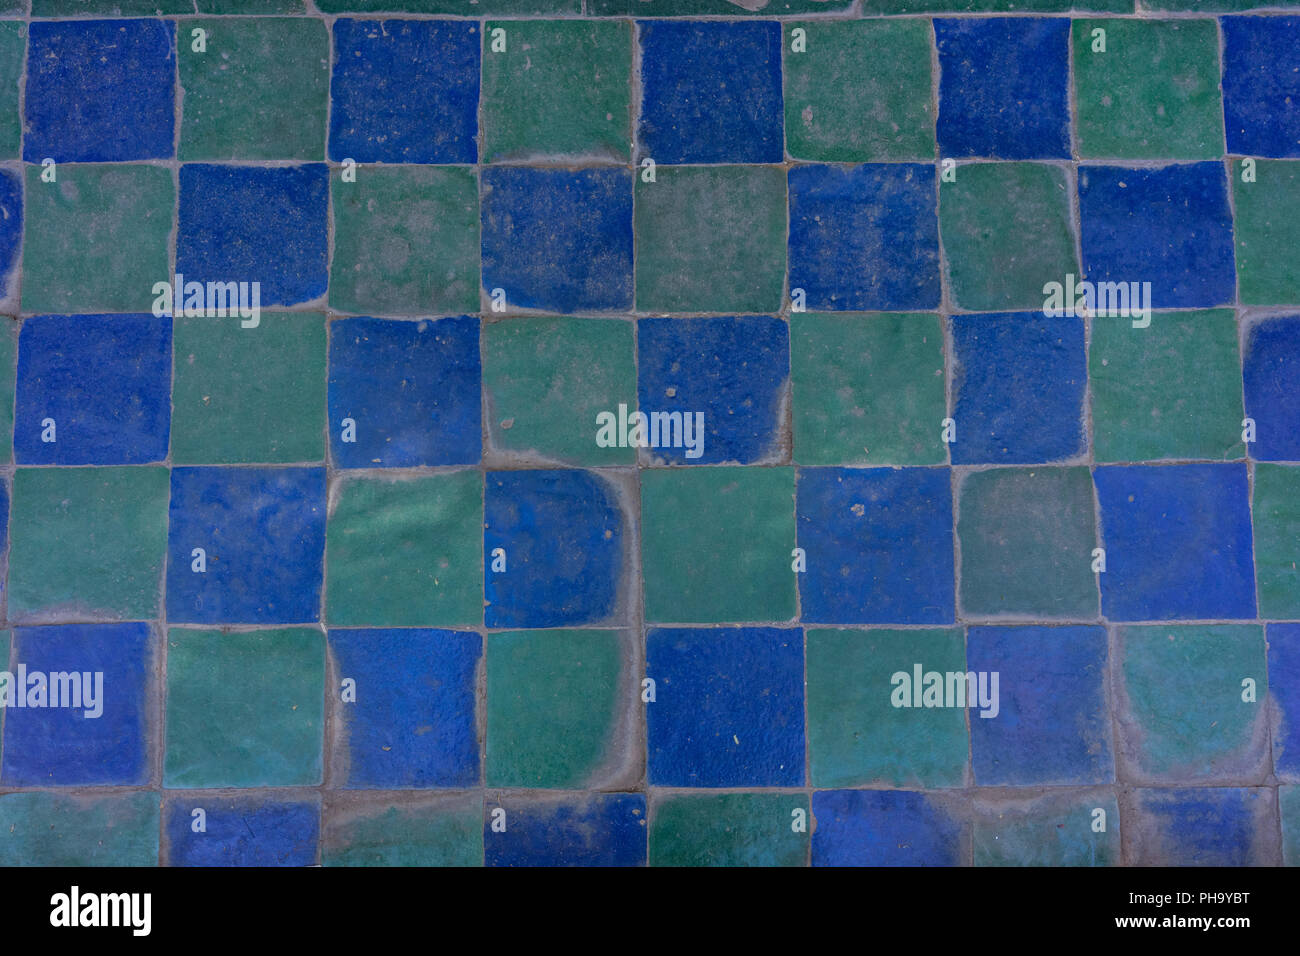 Geometric Mosaic Floor Stock Photos & Geometric Mosaic Floor Stock ...